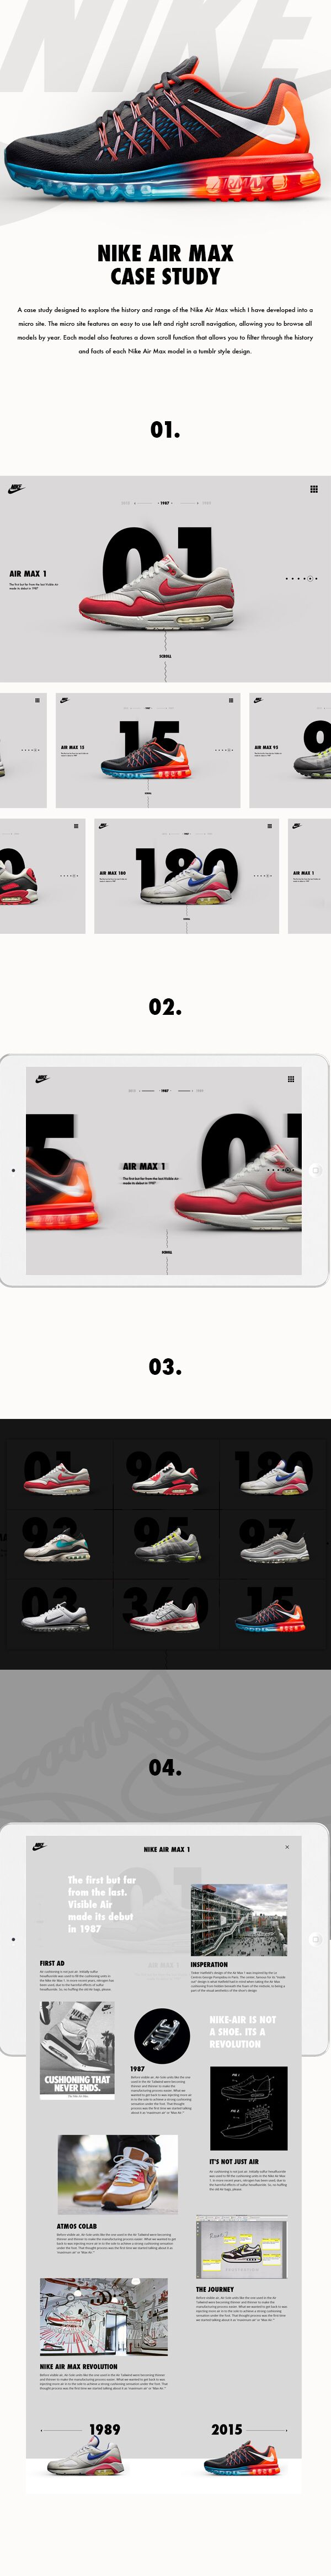 Nike Air Max Case Study by Shaun Gardner